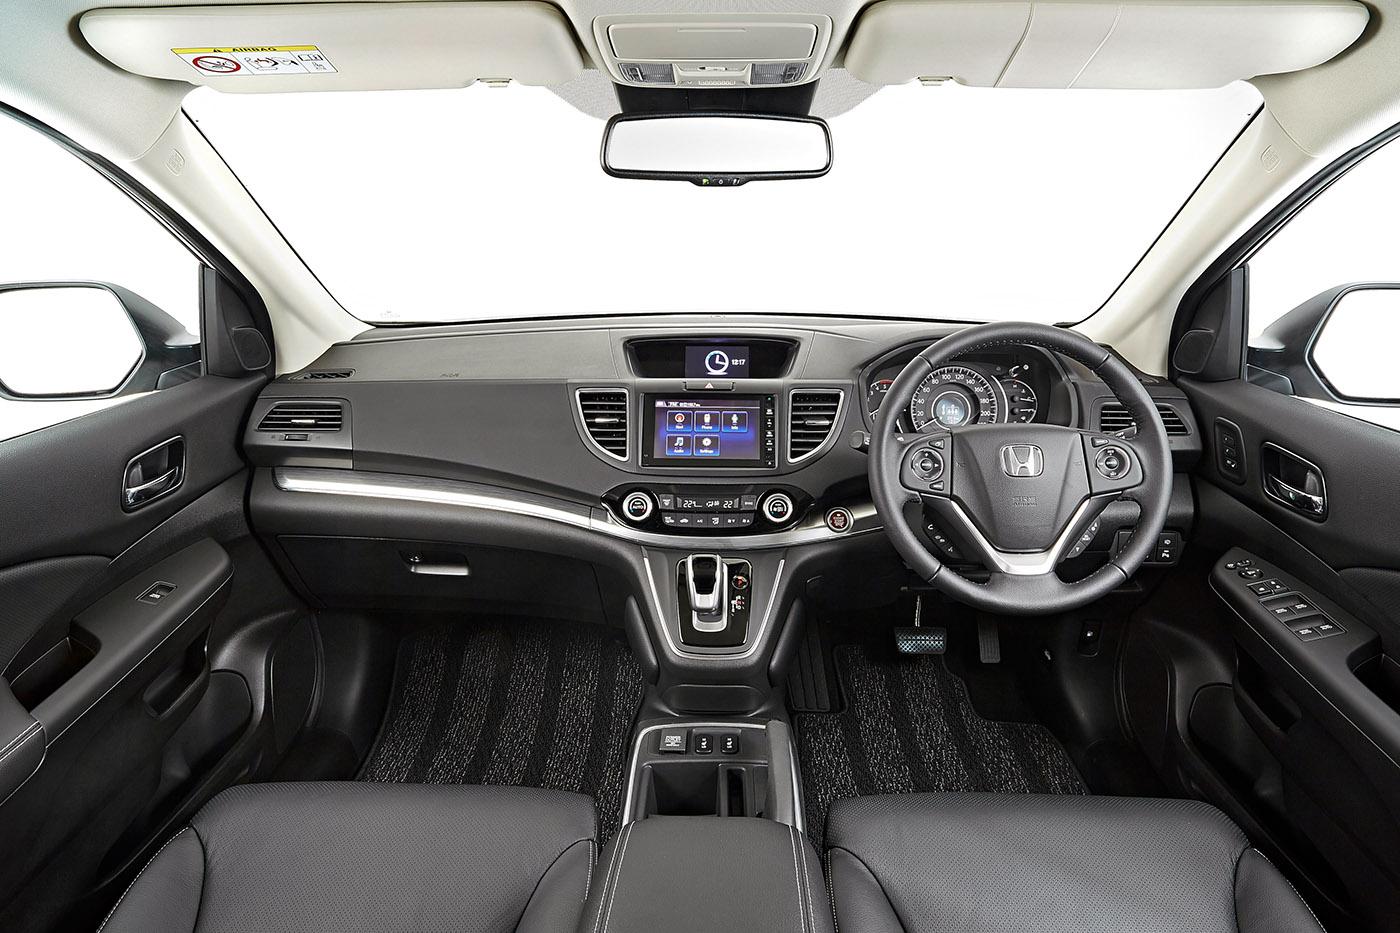 Honda CR-V DTi-L Limited Edition gets 1.6-litre turbo diesel 'Earth Dreams' engine - photos ...